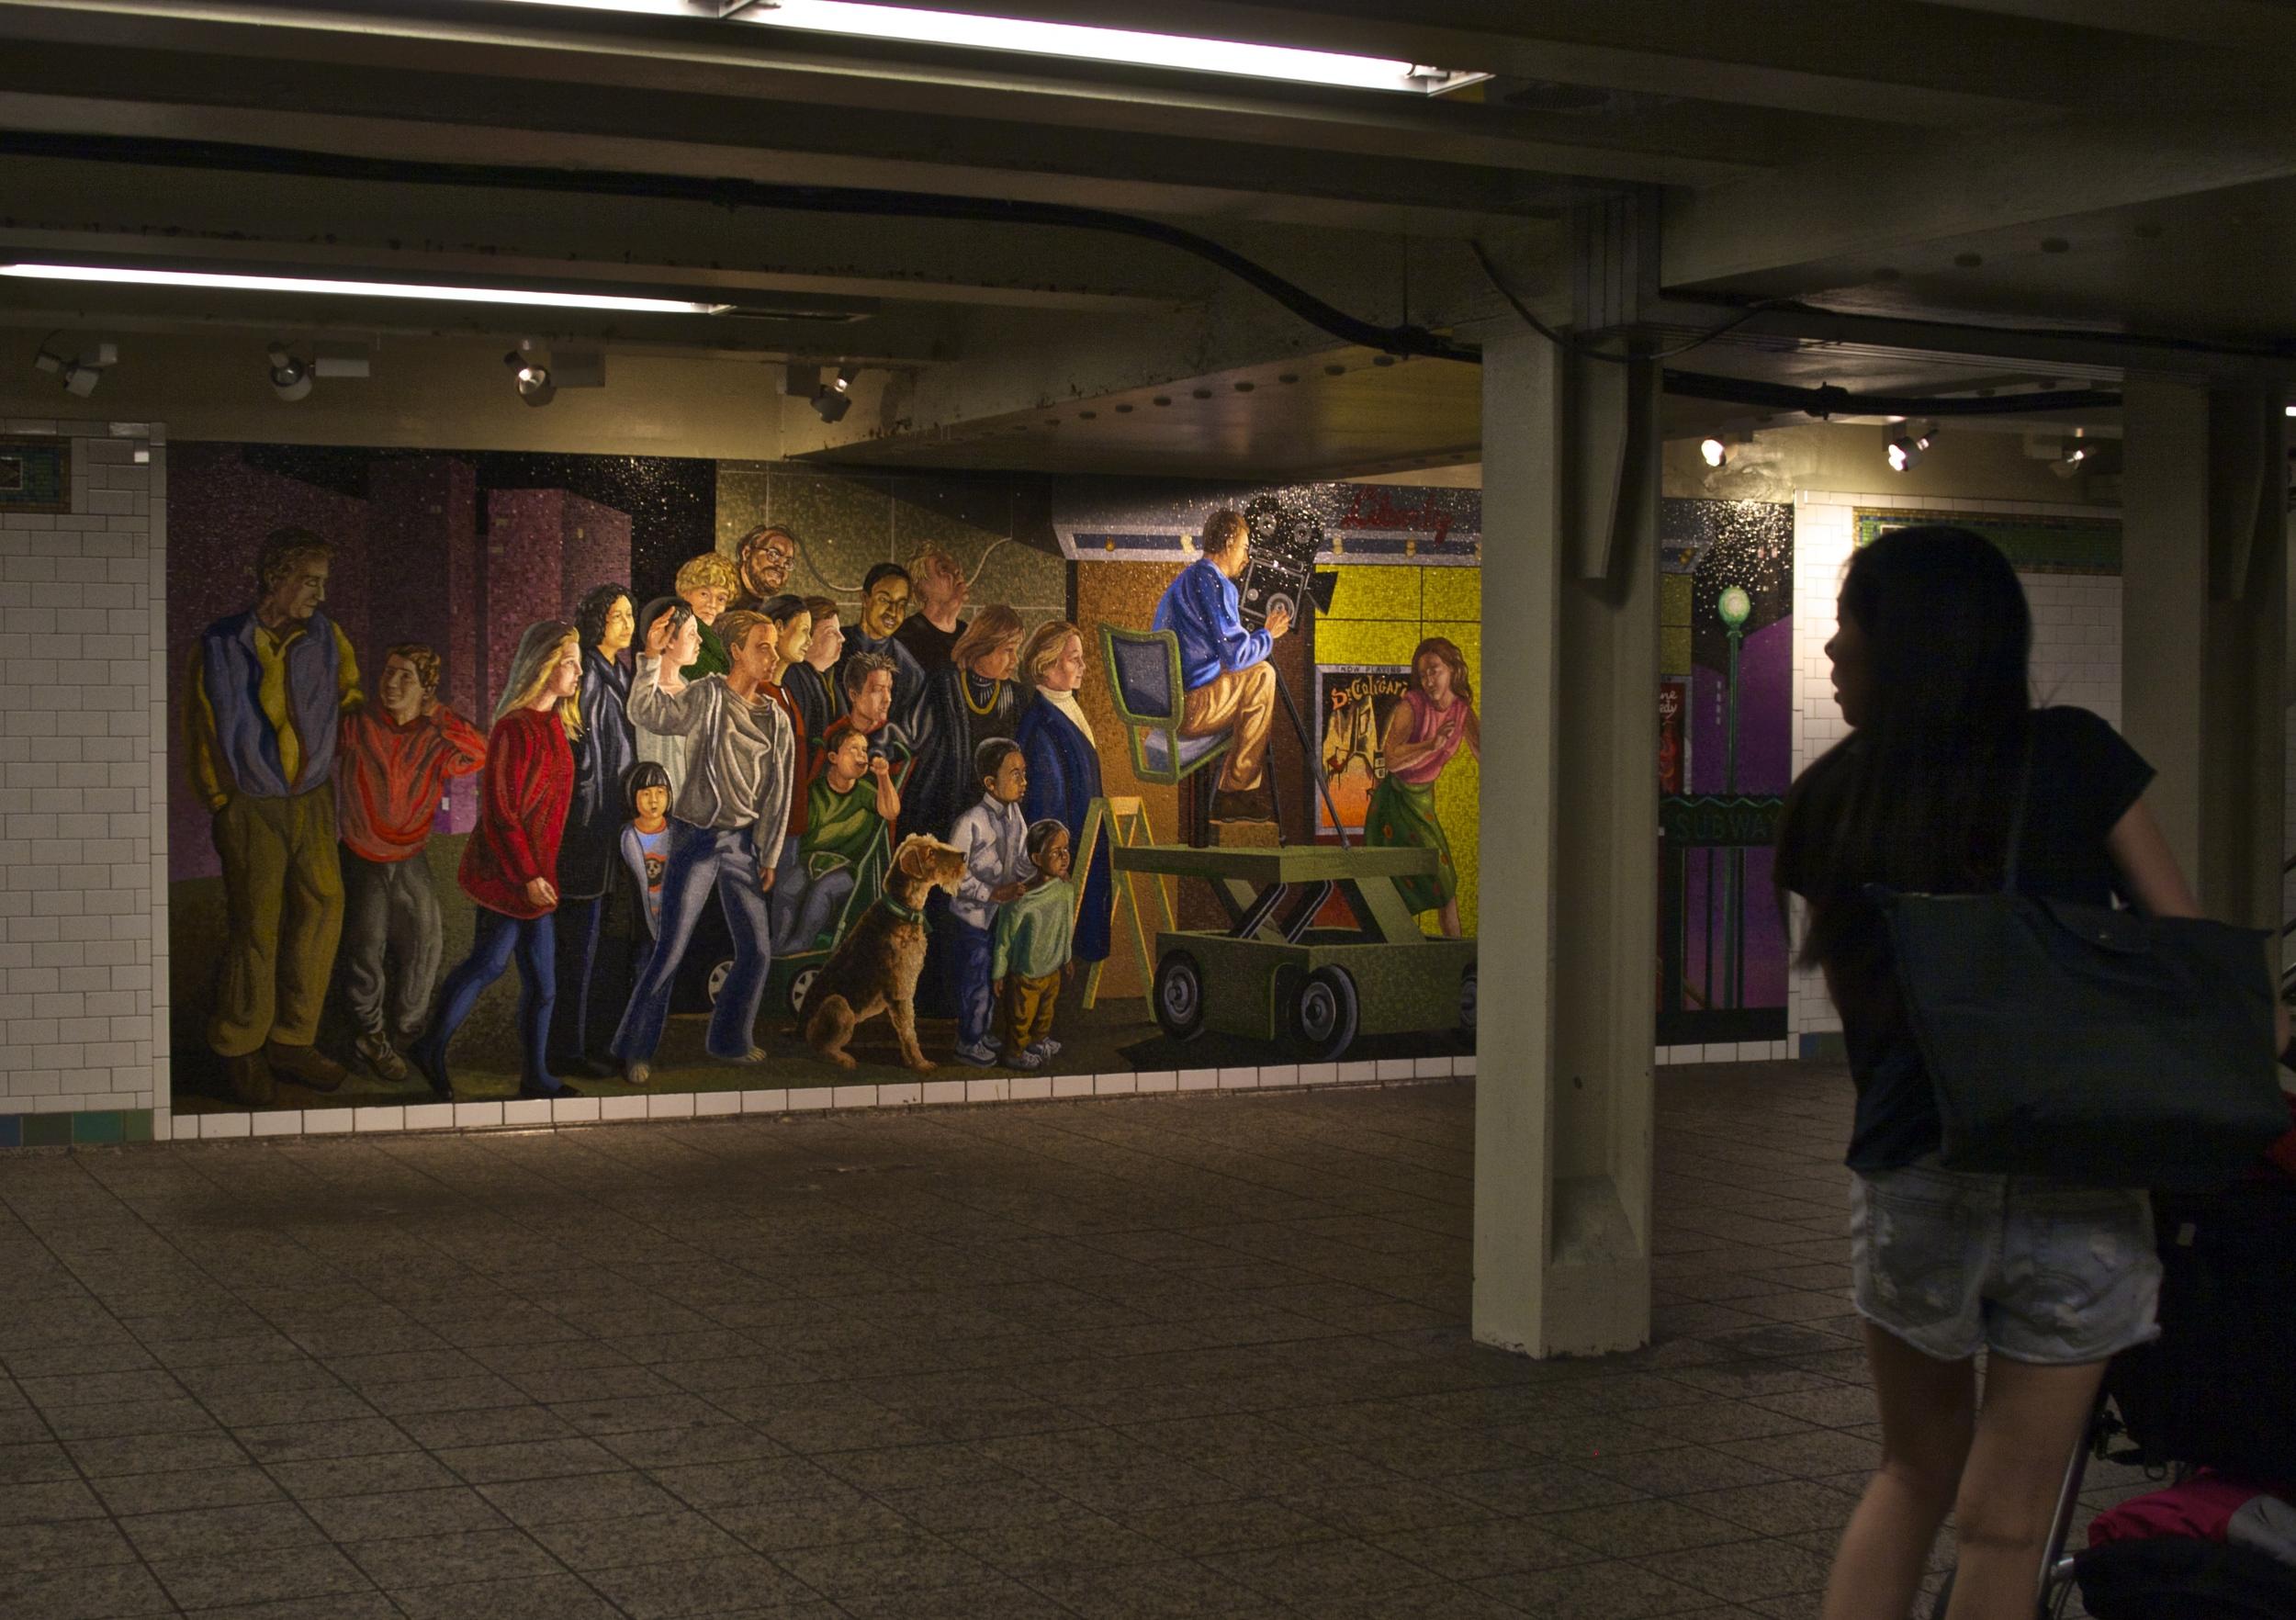 subway-art-nyc-street-timeframes-wbc.jpg